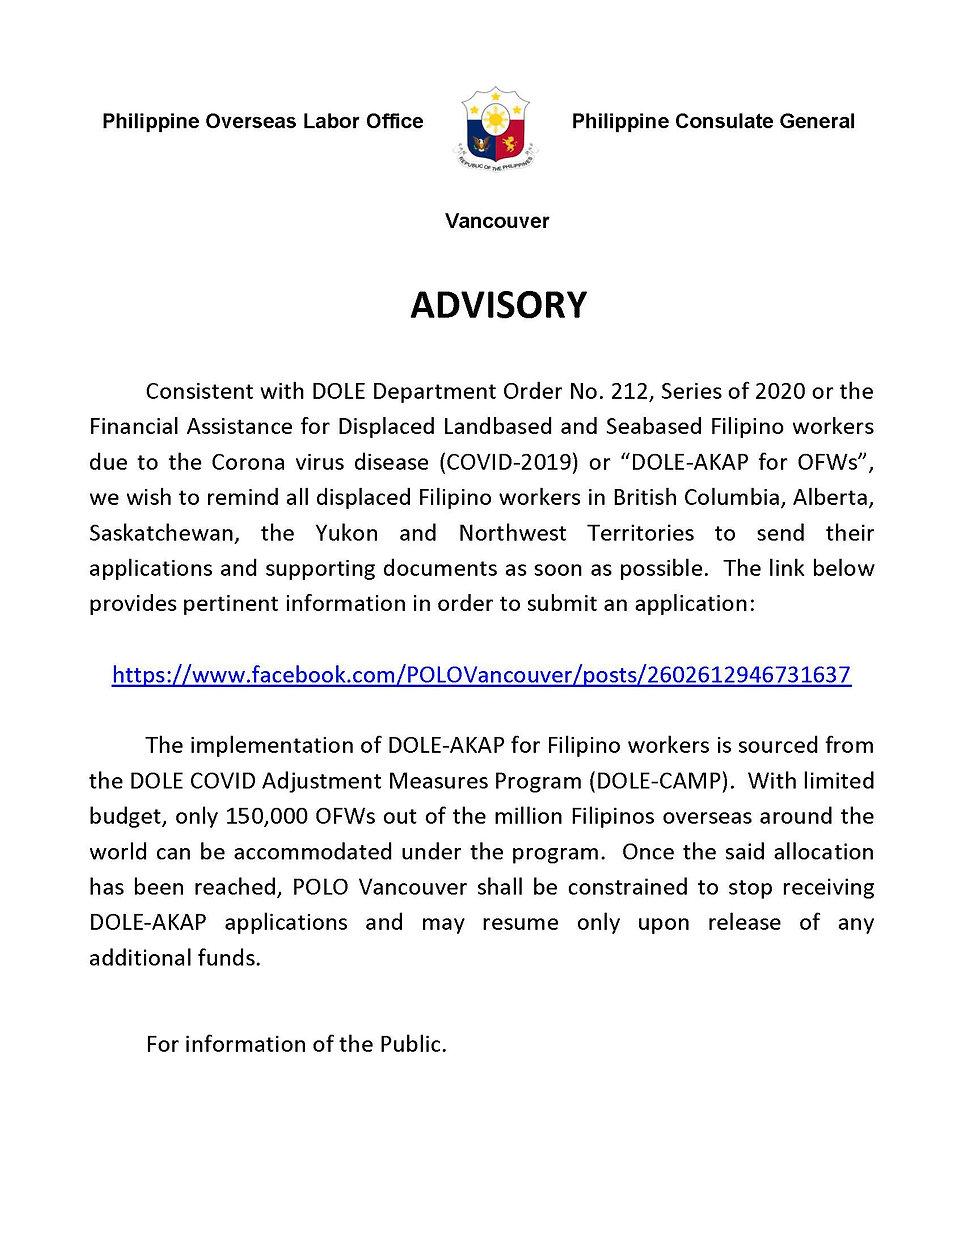 DOLE AKAP Advisory No. 2_final.jpg